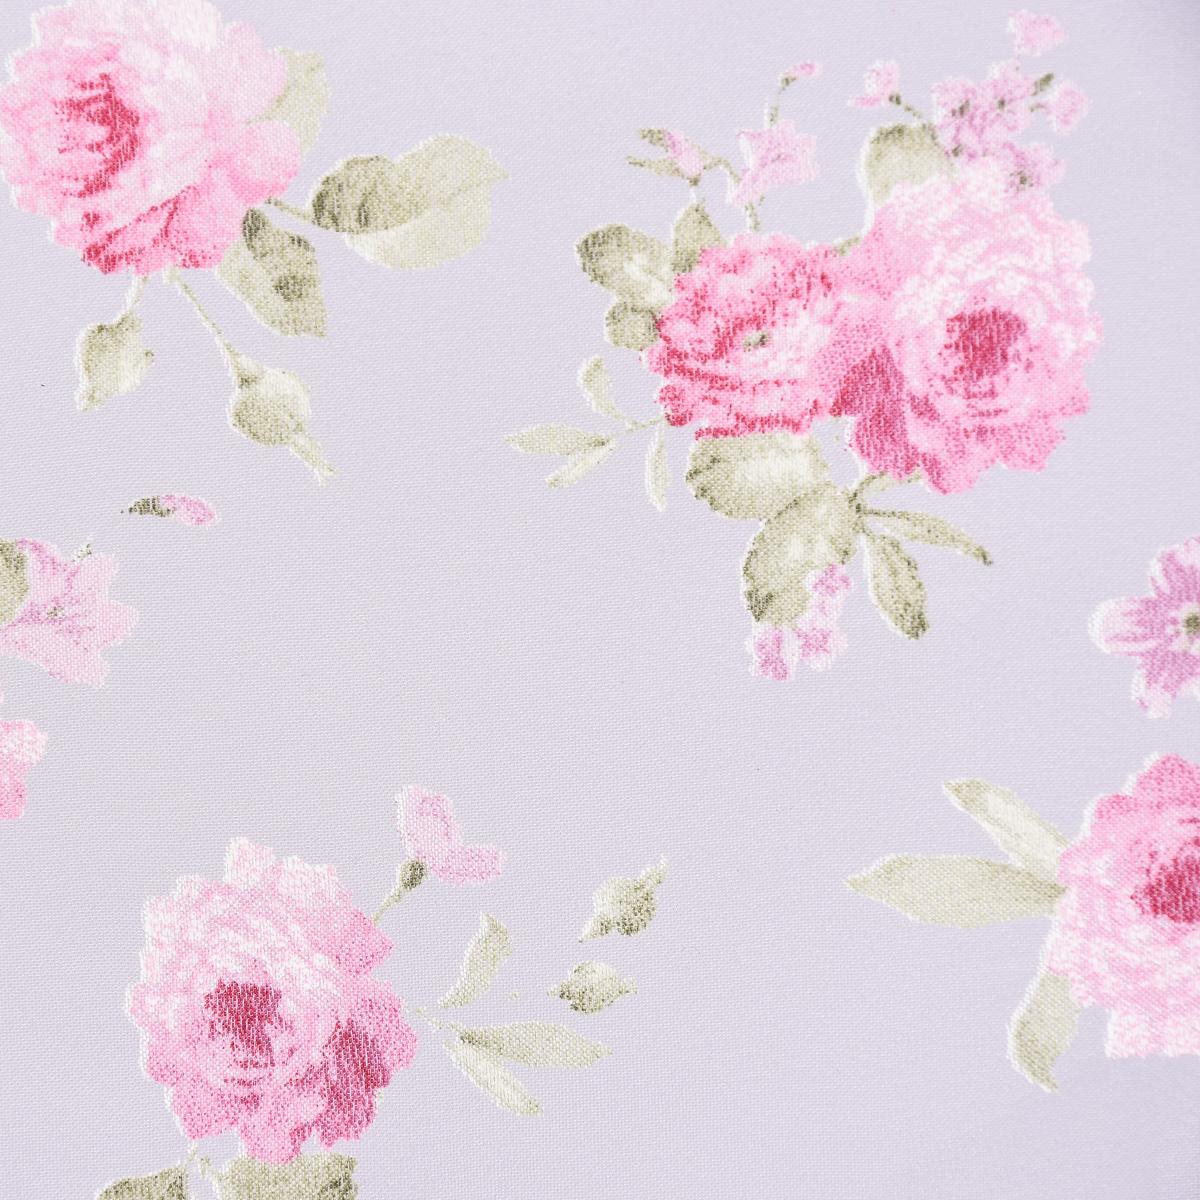 gardinenstoff dekostoff organza pfingstrosen klein wei rosa gr n 2 8m h he gardinenstoffe. Black Bedroom Furniture Sets. Home Design Ideas